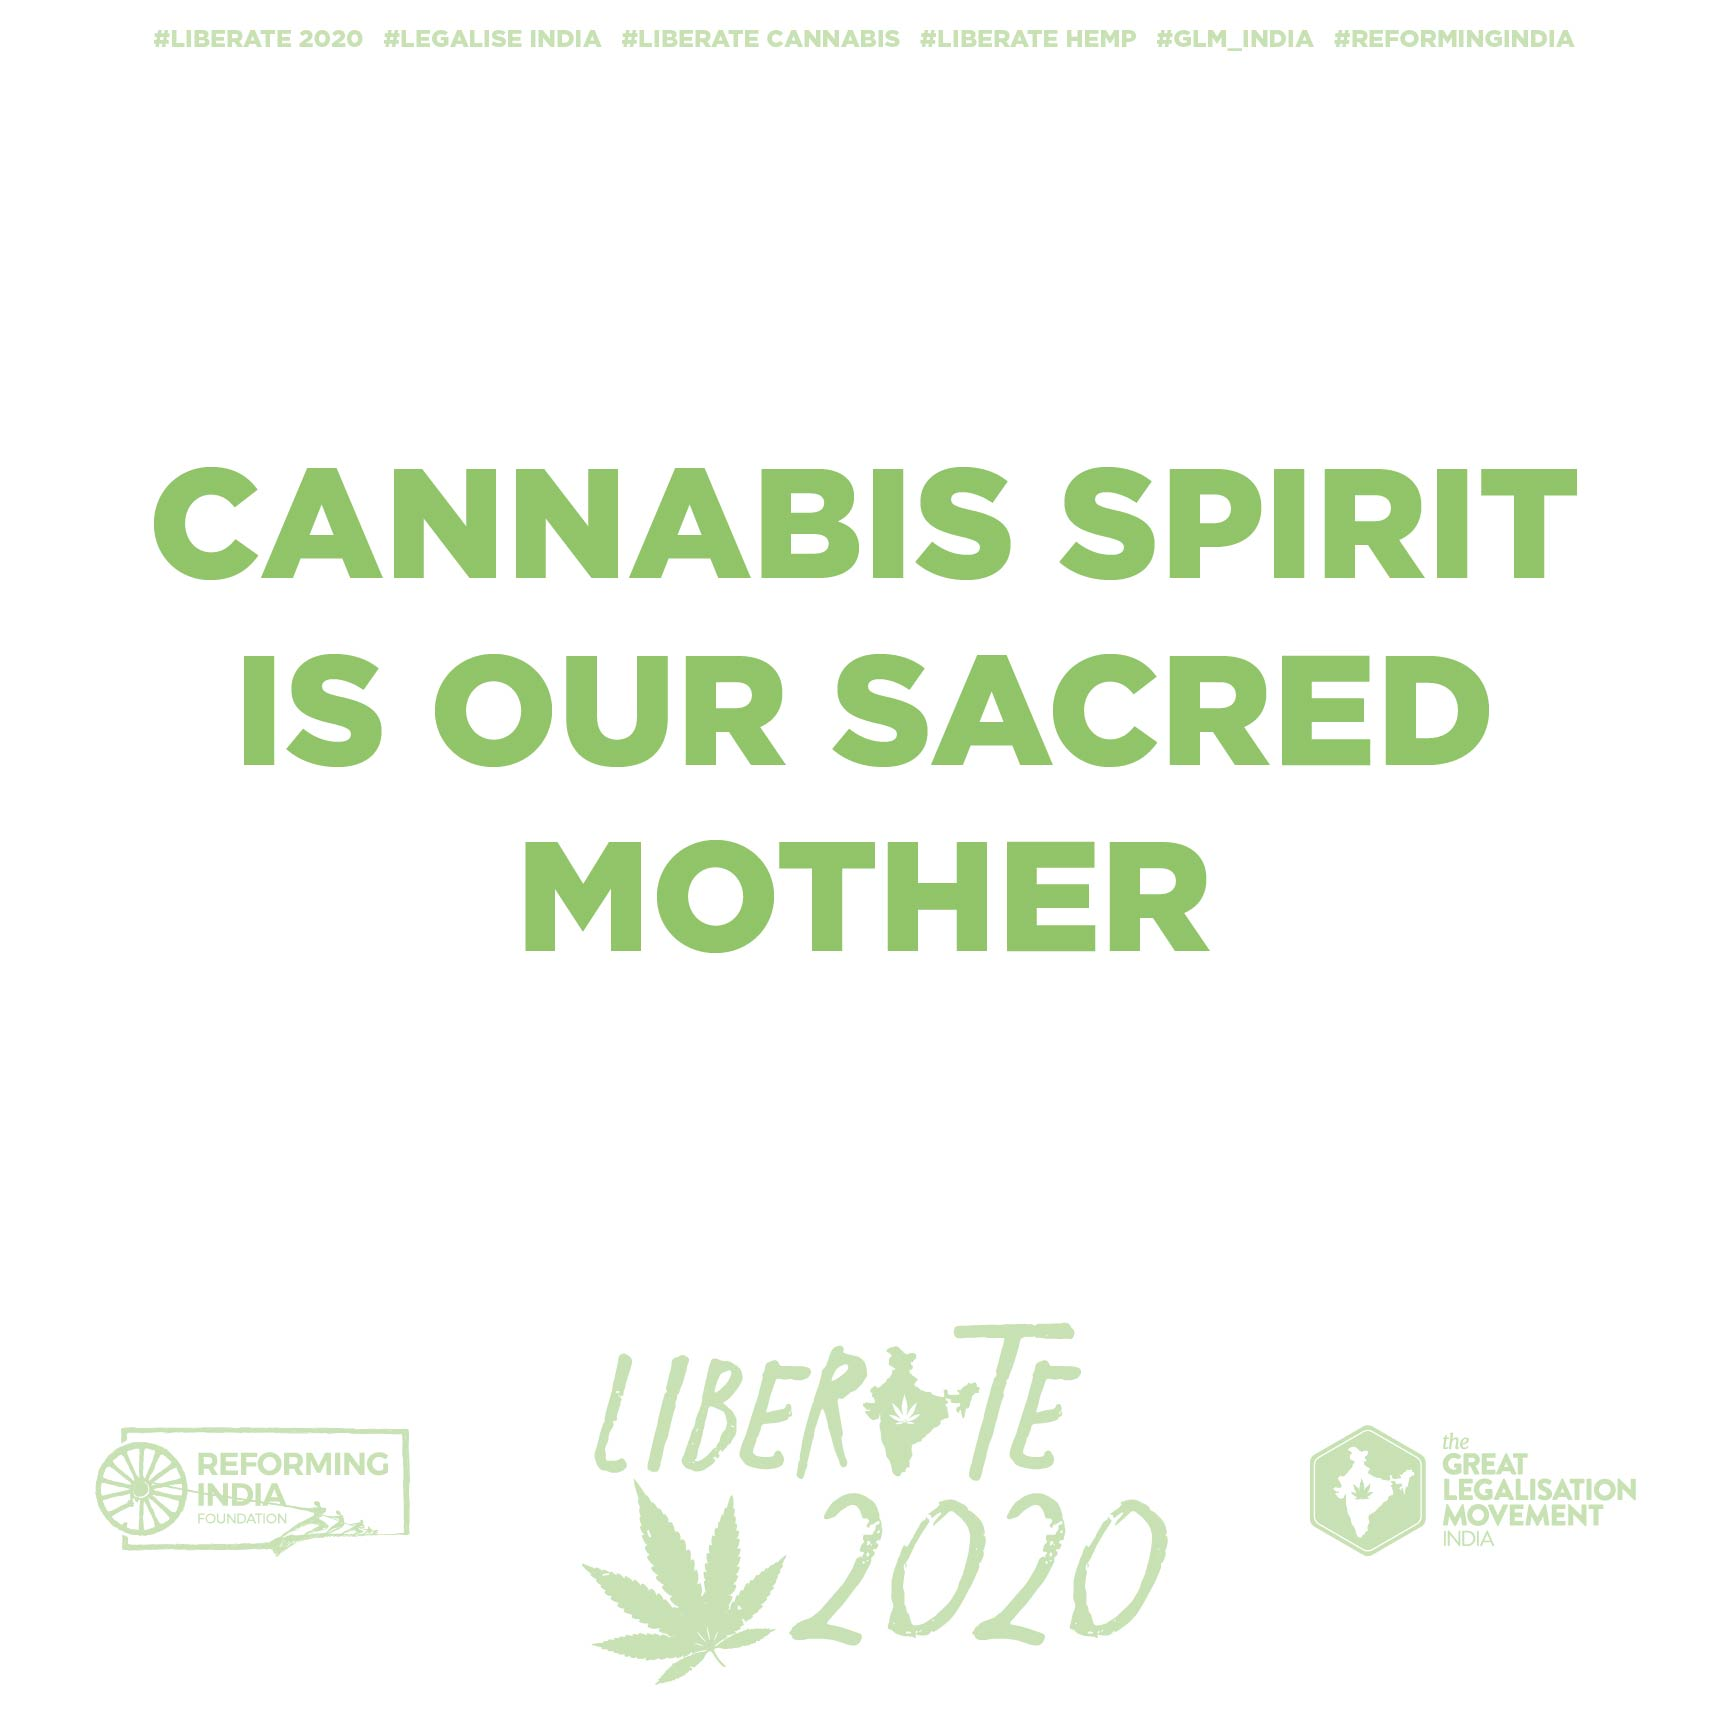 cannabisArtboard 1 copy 3-50.jpg